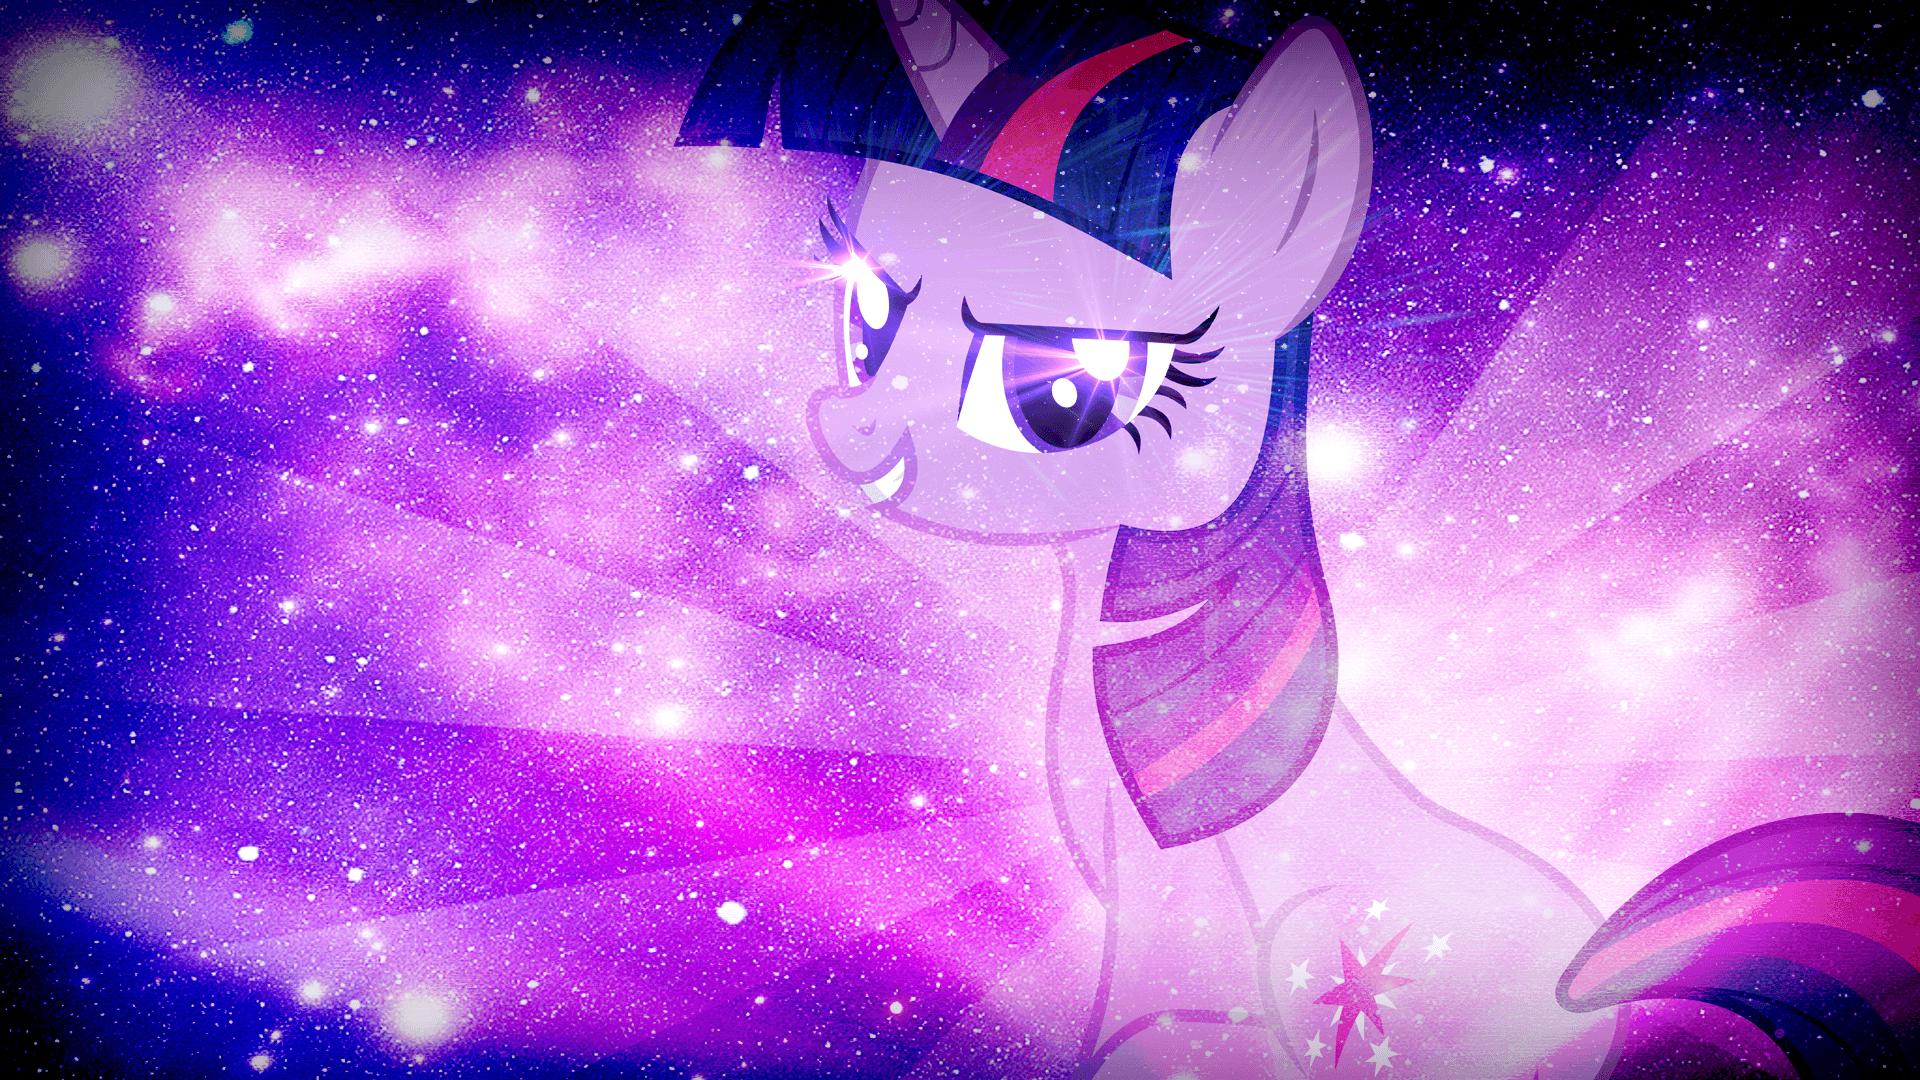 Twilight Sparkle Wallpaper Iphone